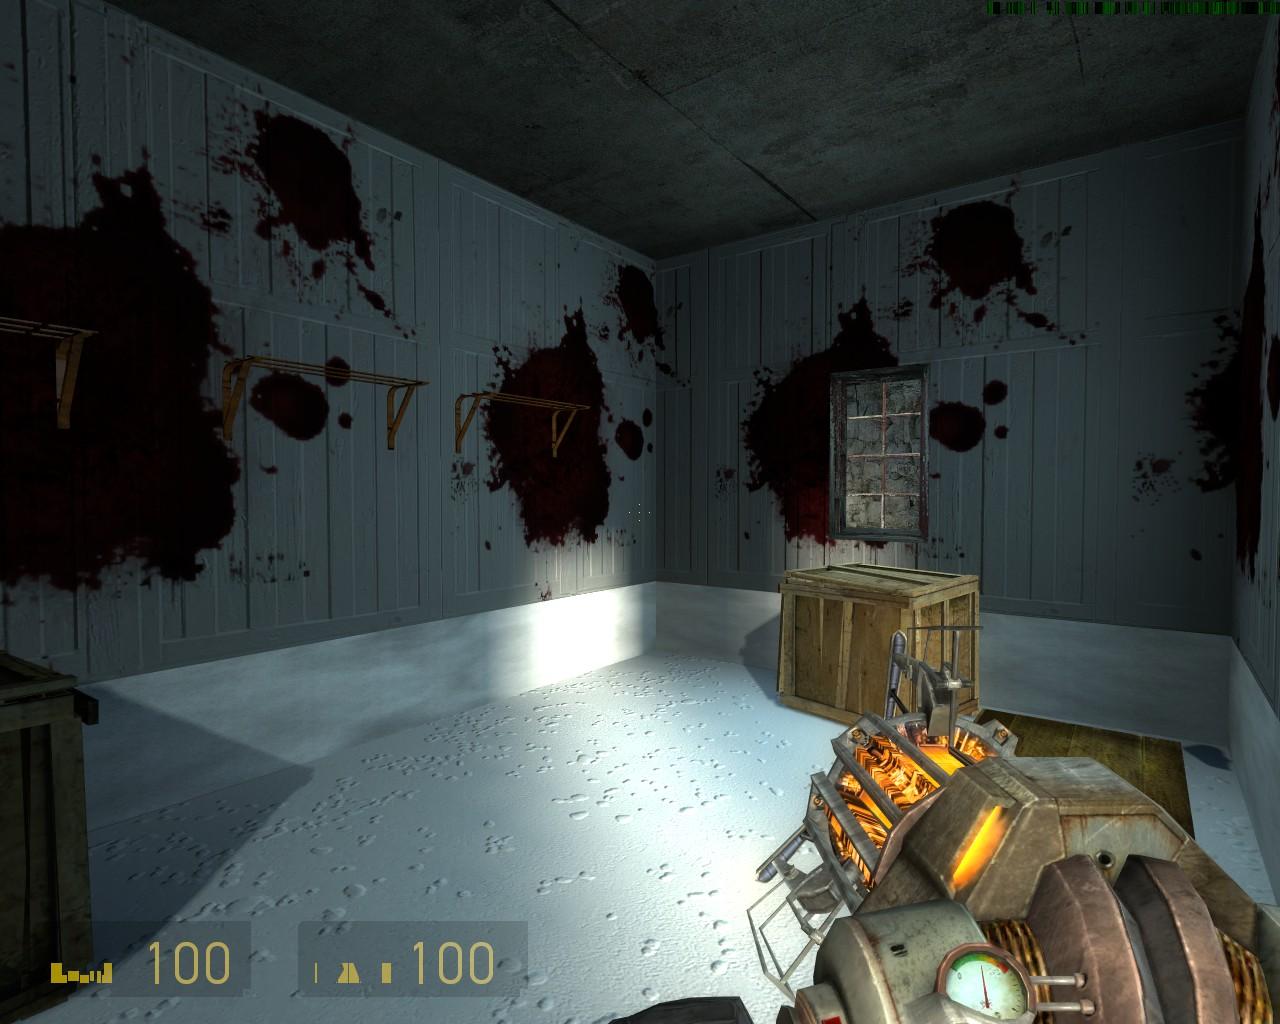 d2_coast_110008.jpg - Half-Life 2